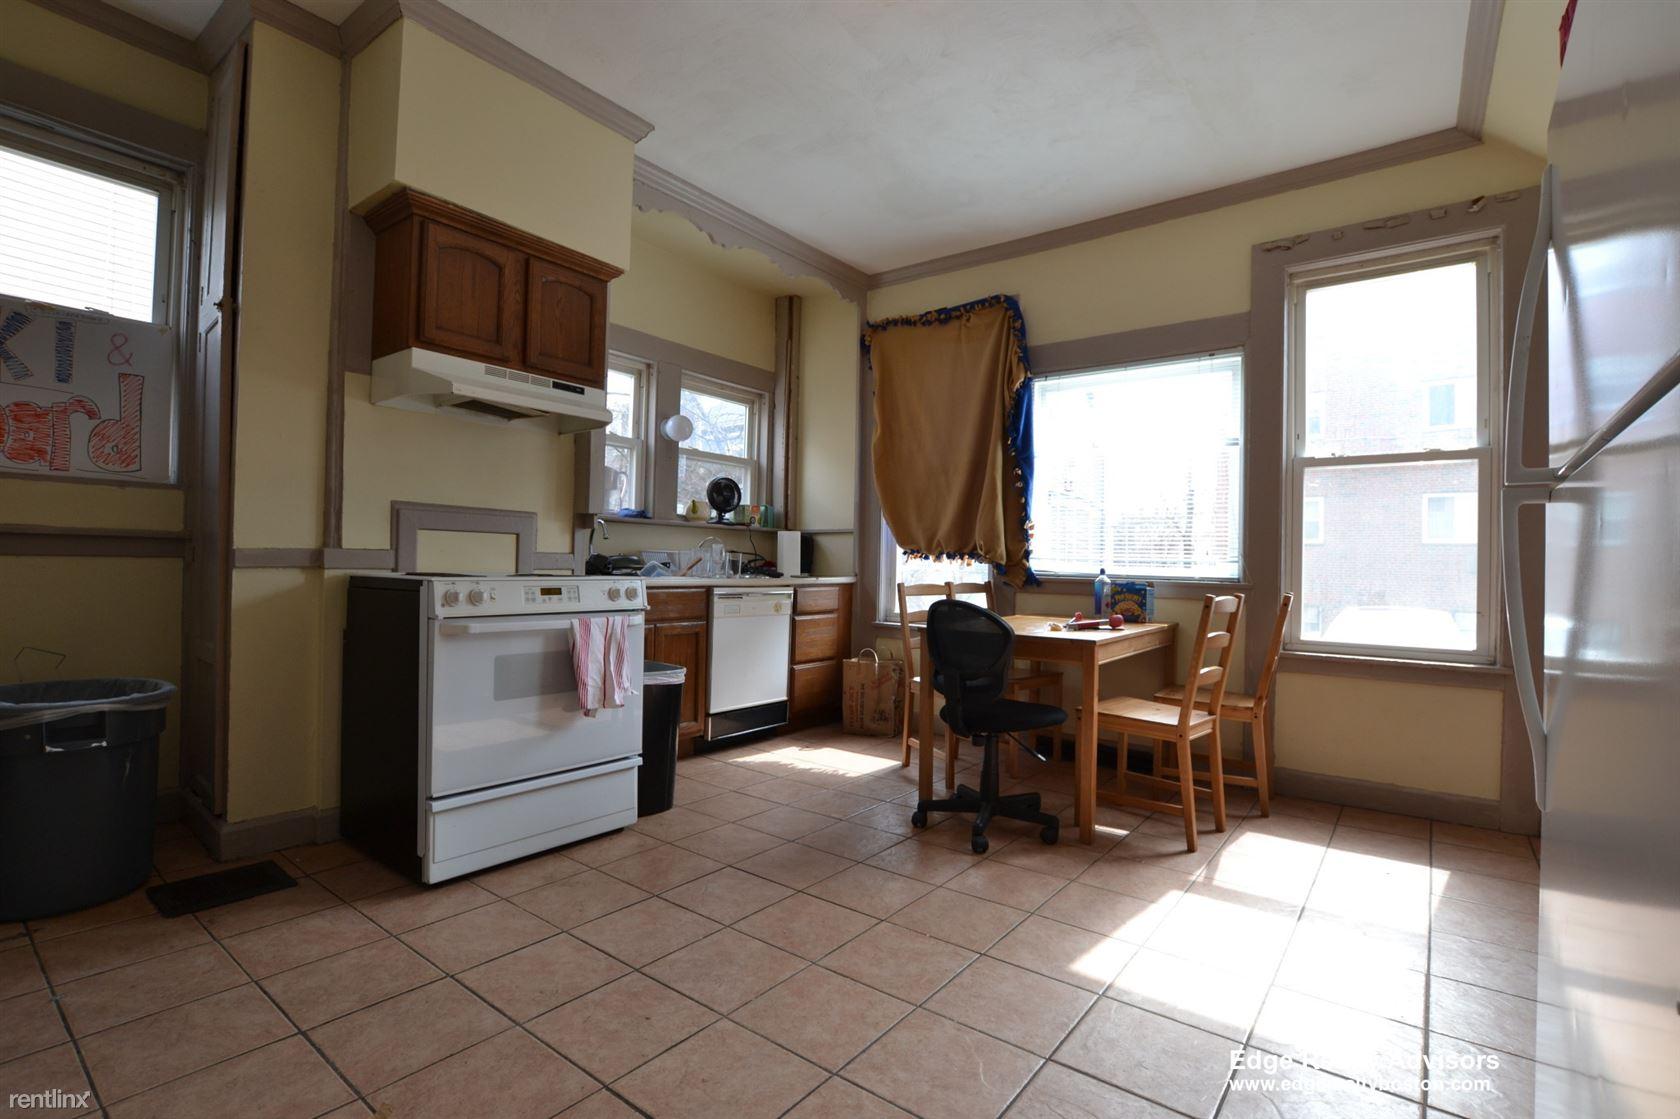 44 Linden St, Allston, MA - $6,500